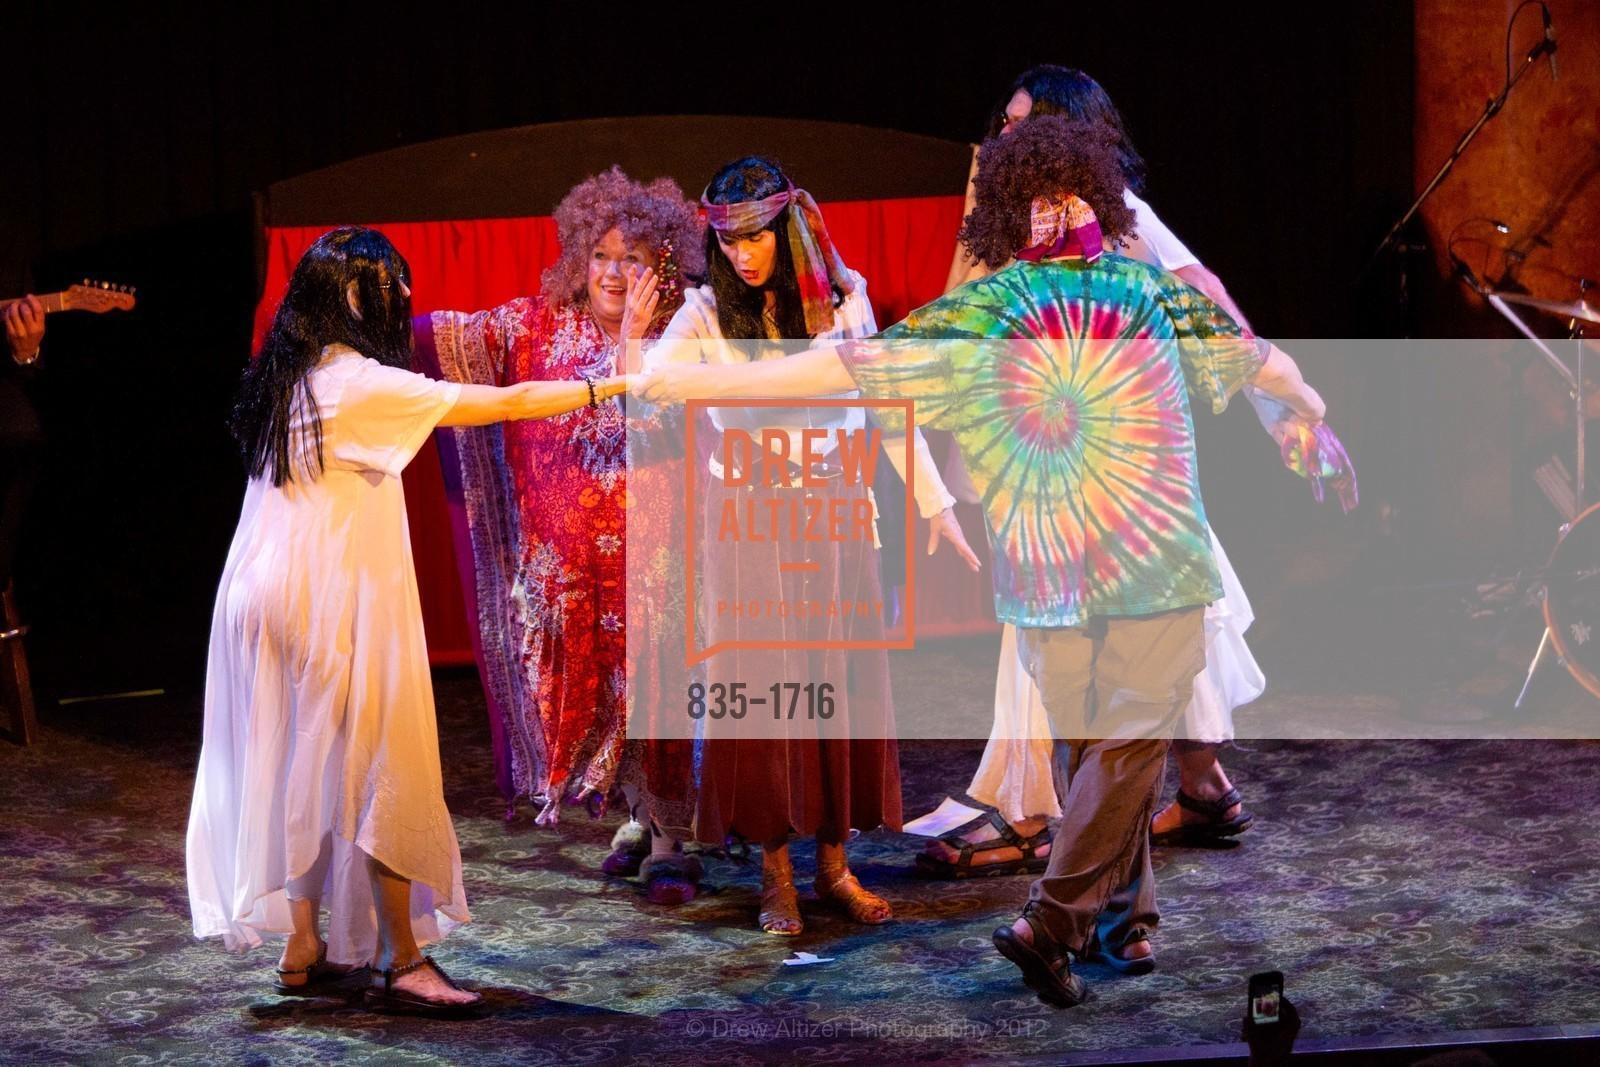 Performance, Photo #835-1716